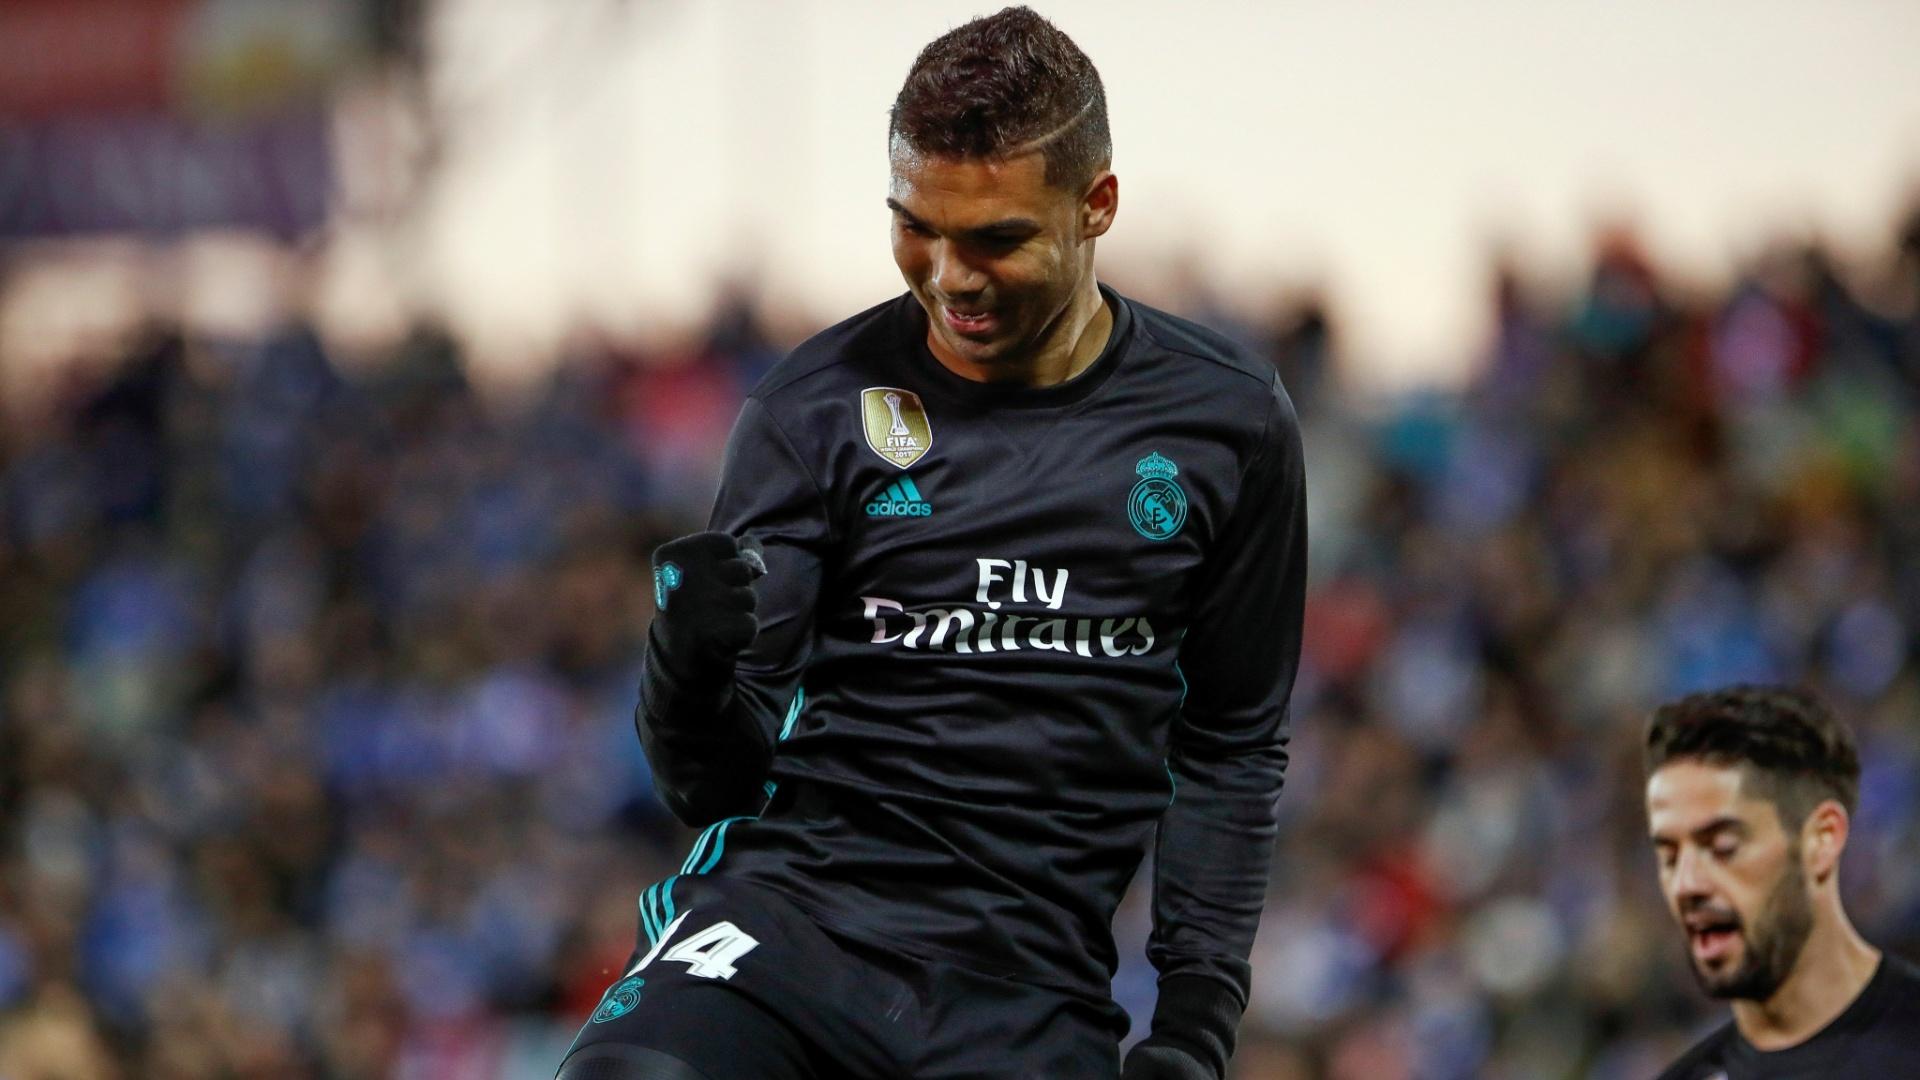 Casemiro comemora a virada do Real Madrid sobre o Leganés